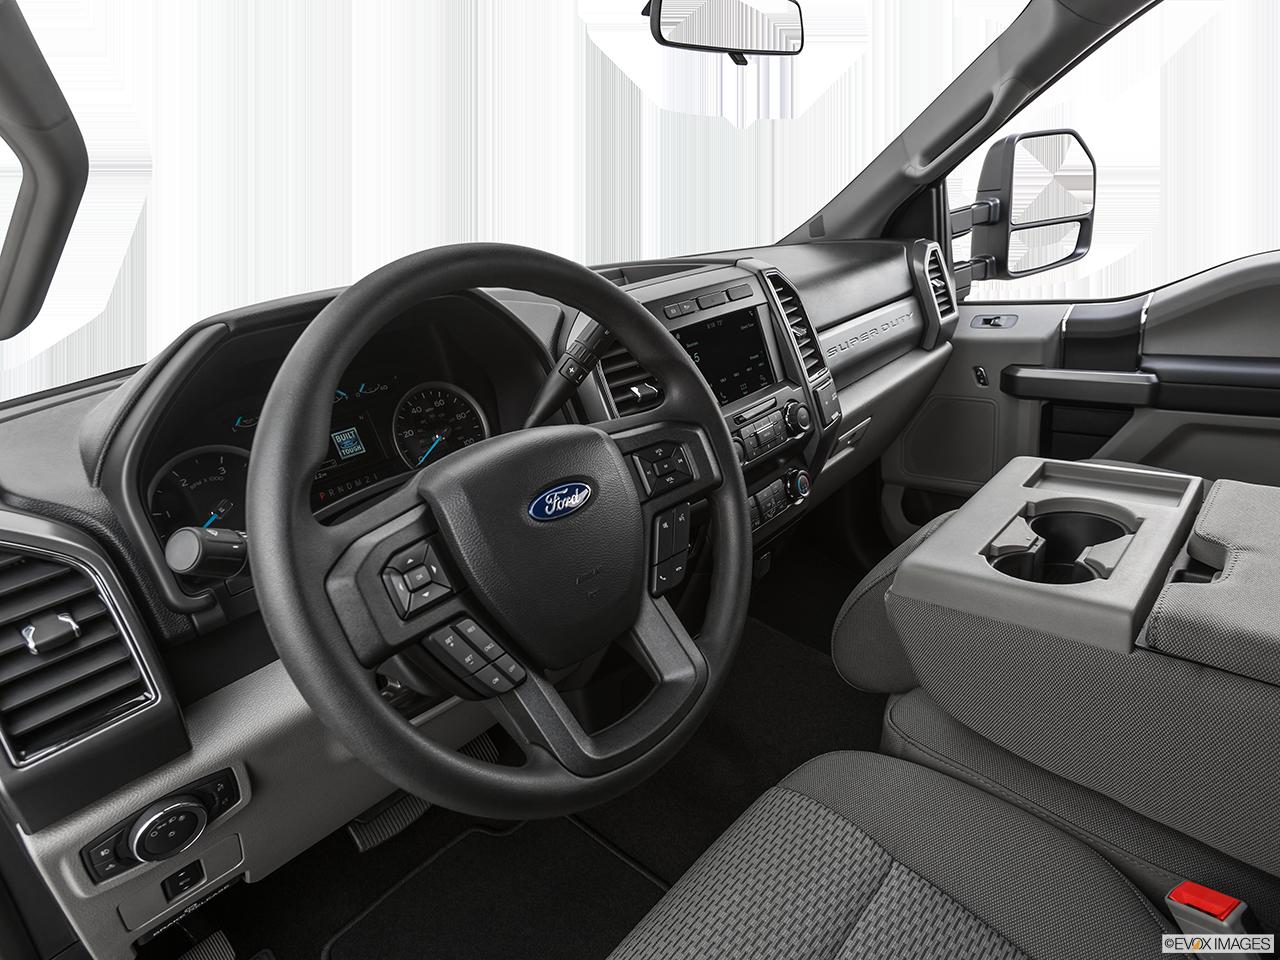 2019 Ford F-350 Super Duty photo